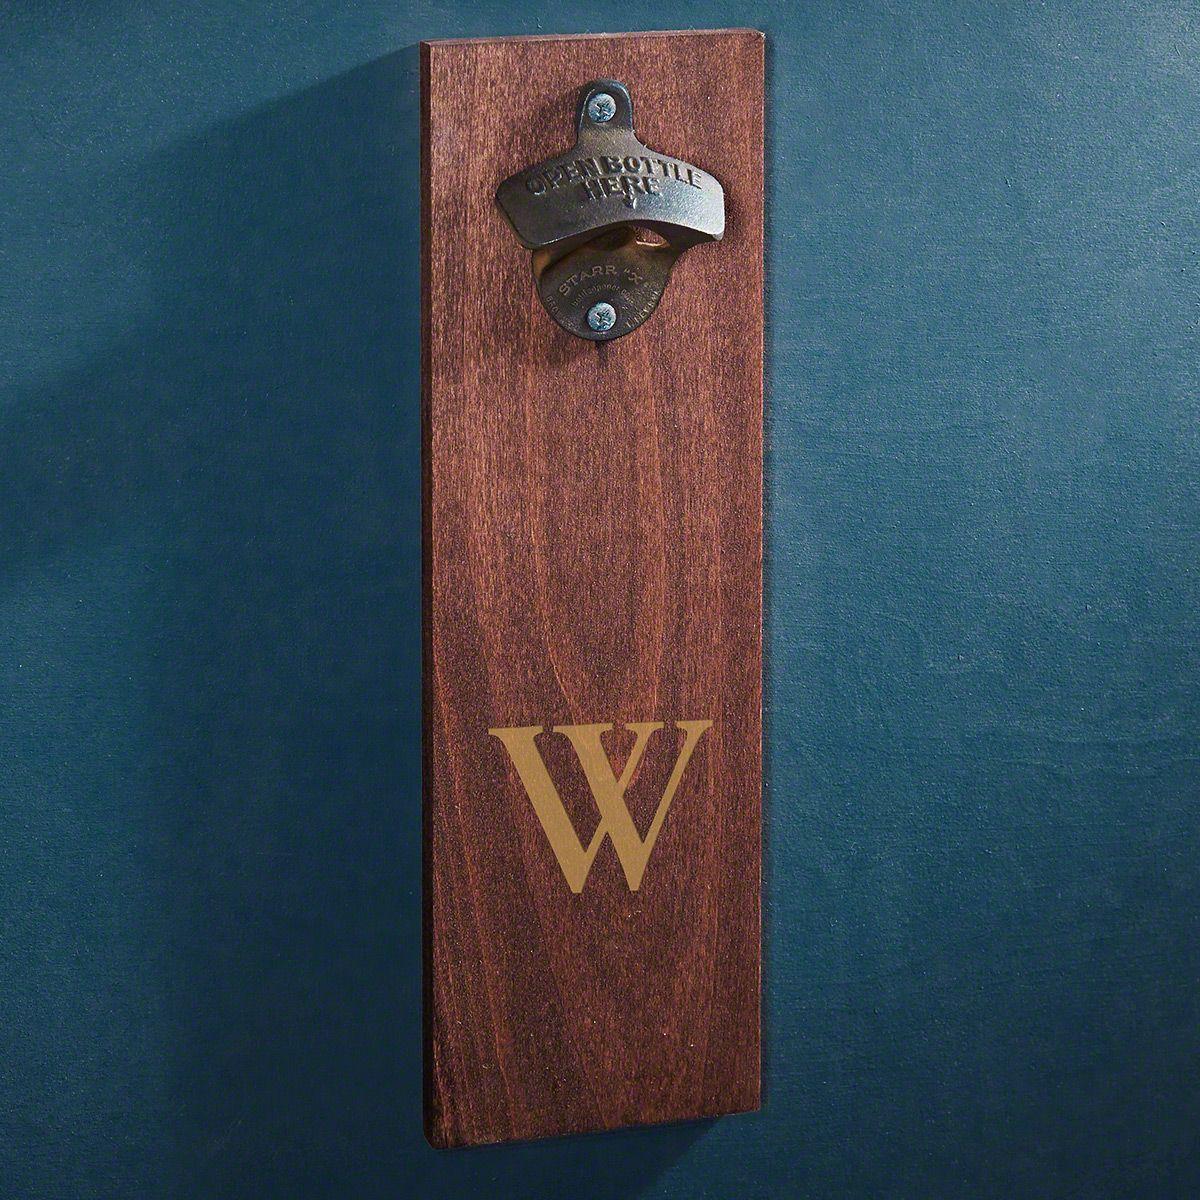 Personalized Wooden Wall Bottle Opener